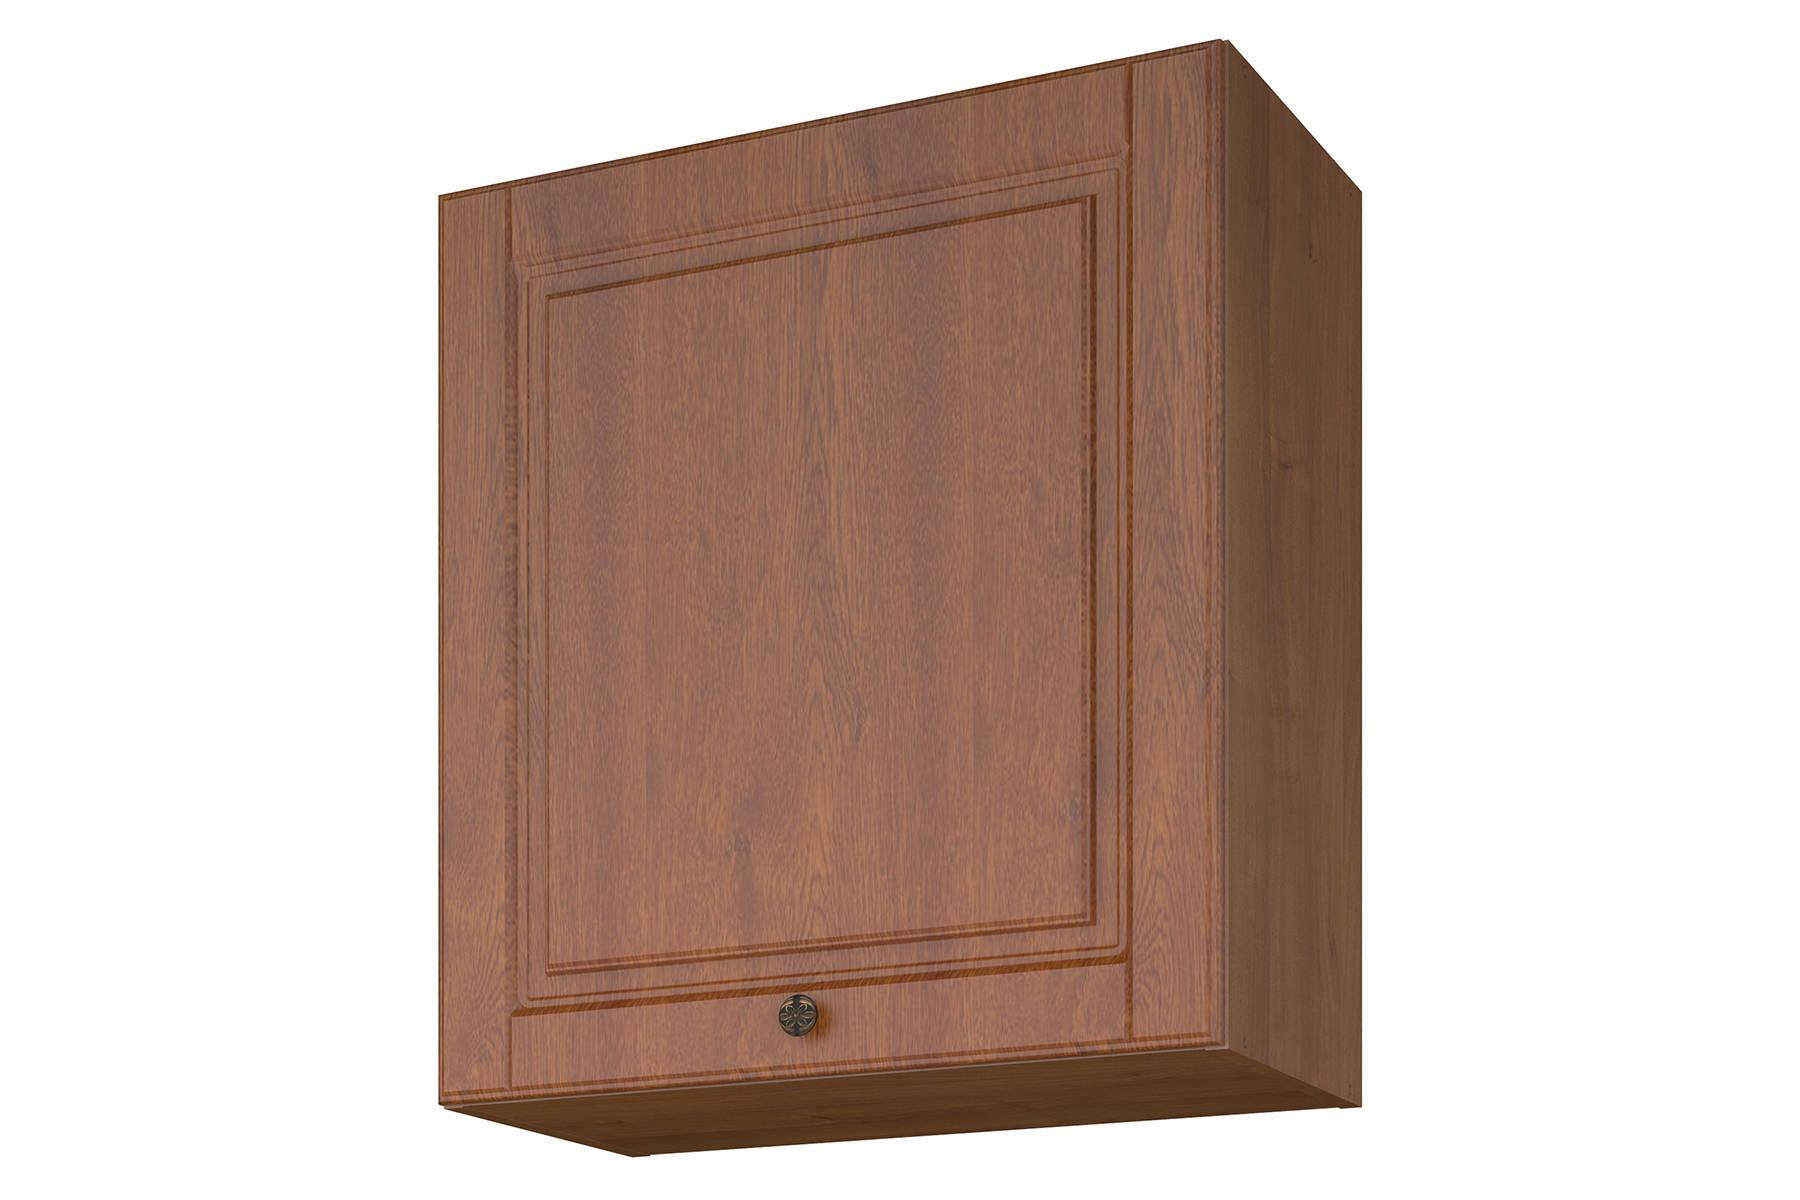 Шкаф навесной Lima СТЛ.308.02 шкаф навесной для вытяжки lima стл 308 04